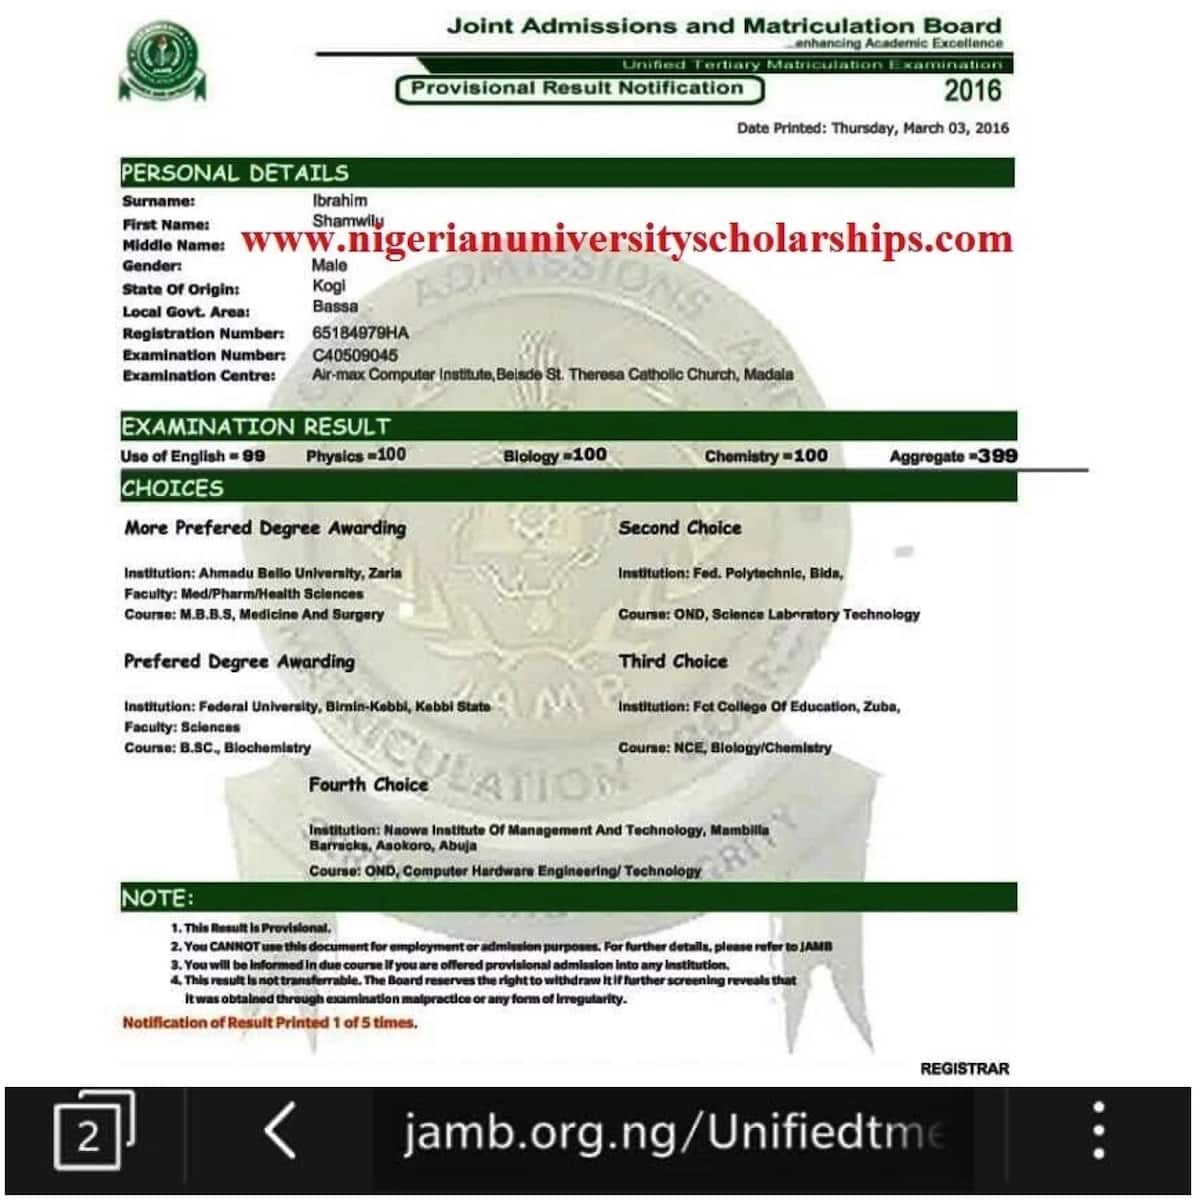 JAMB results